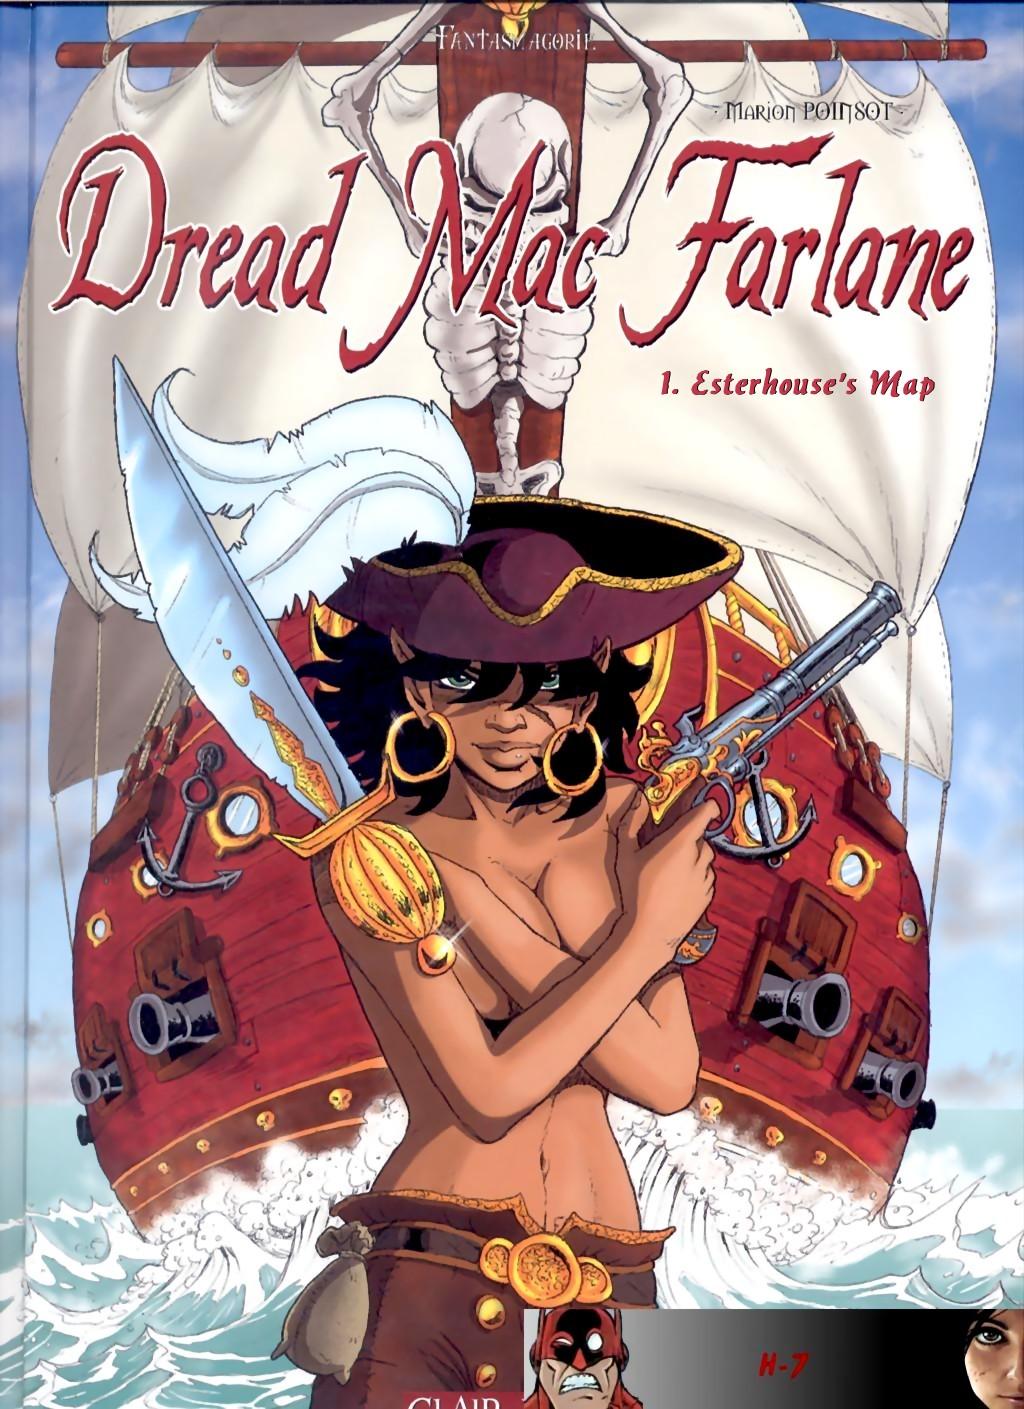 [Marion Poinsot] Dread Mac Farlane #1: Esterhouse's Map (Peter Pan) [English]